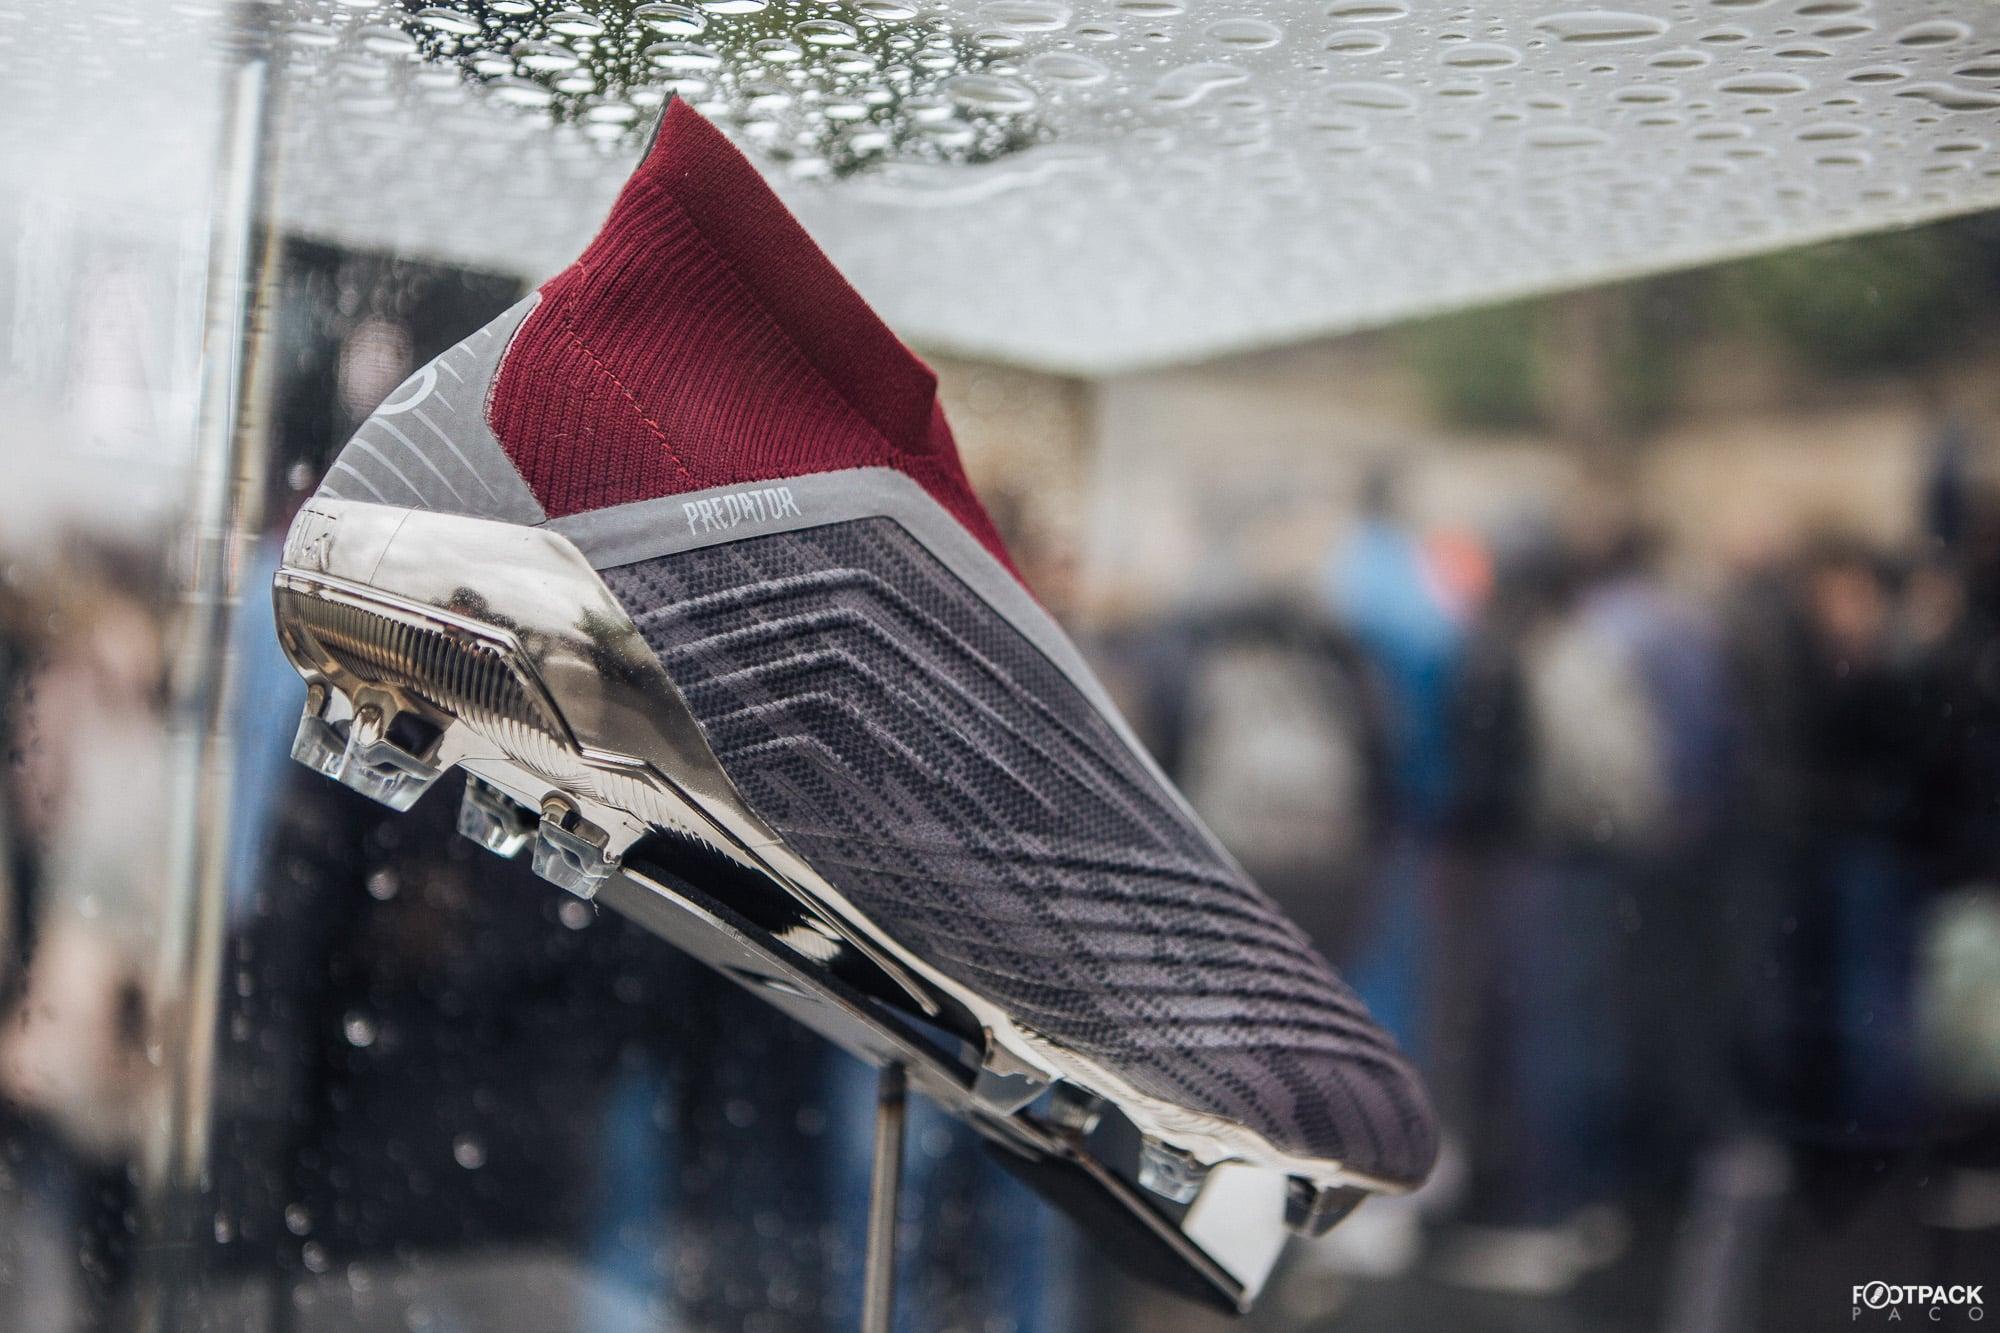 Chaussures-football-didas-predator-pogba-avril-2018-9